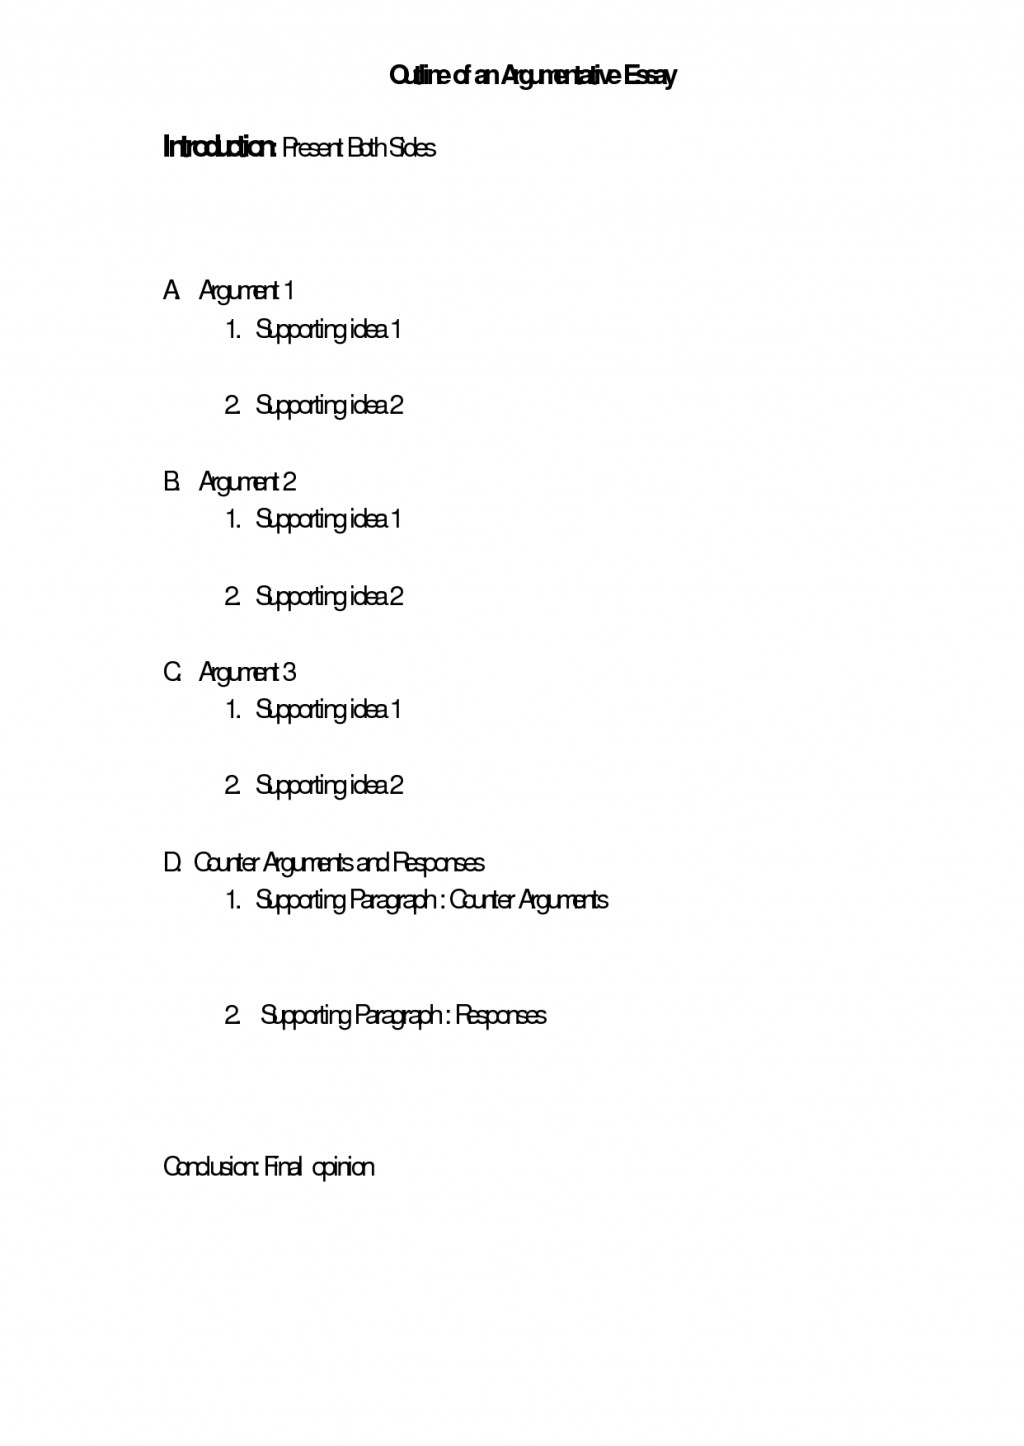 009 Argument Essay Outline Debate Goal Blockety Co Z4bas Argumentative Format Structure Mla Remarkable Template Example Pdf Large